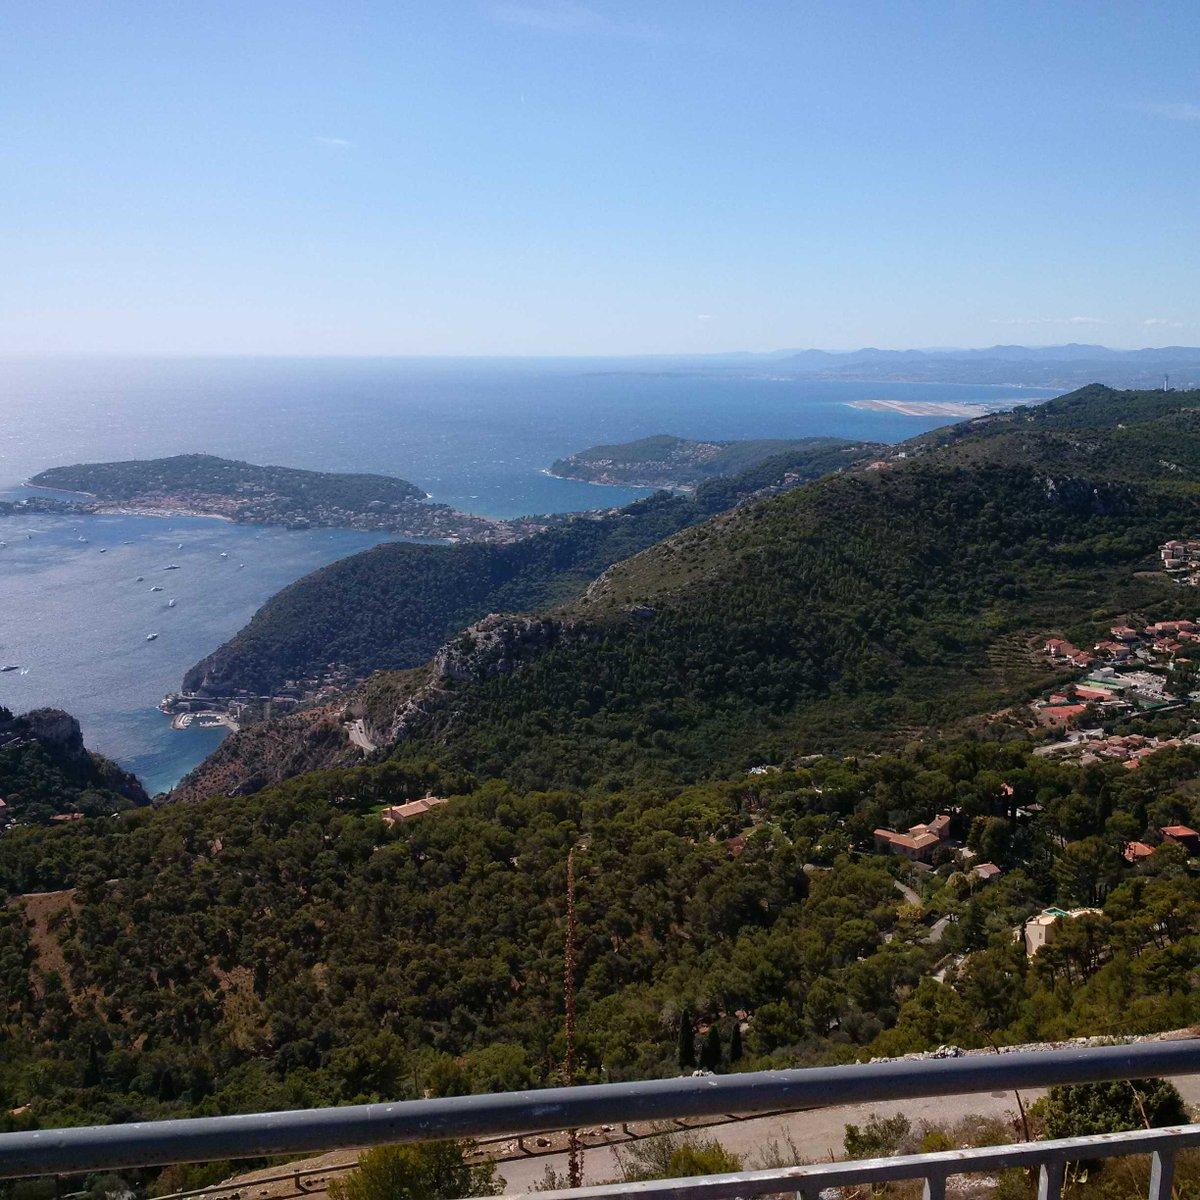 Great view from National Parc Grande Corniche of Cap Ferrat  : @scatalano  #CotedAzurFrance <br>http://pic.twitter.com/BRVoASak2T